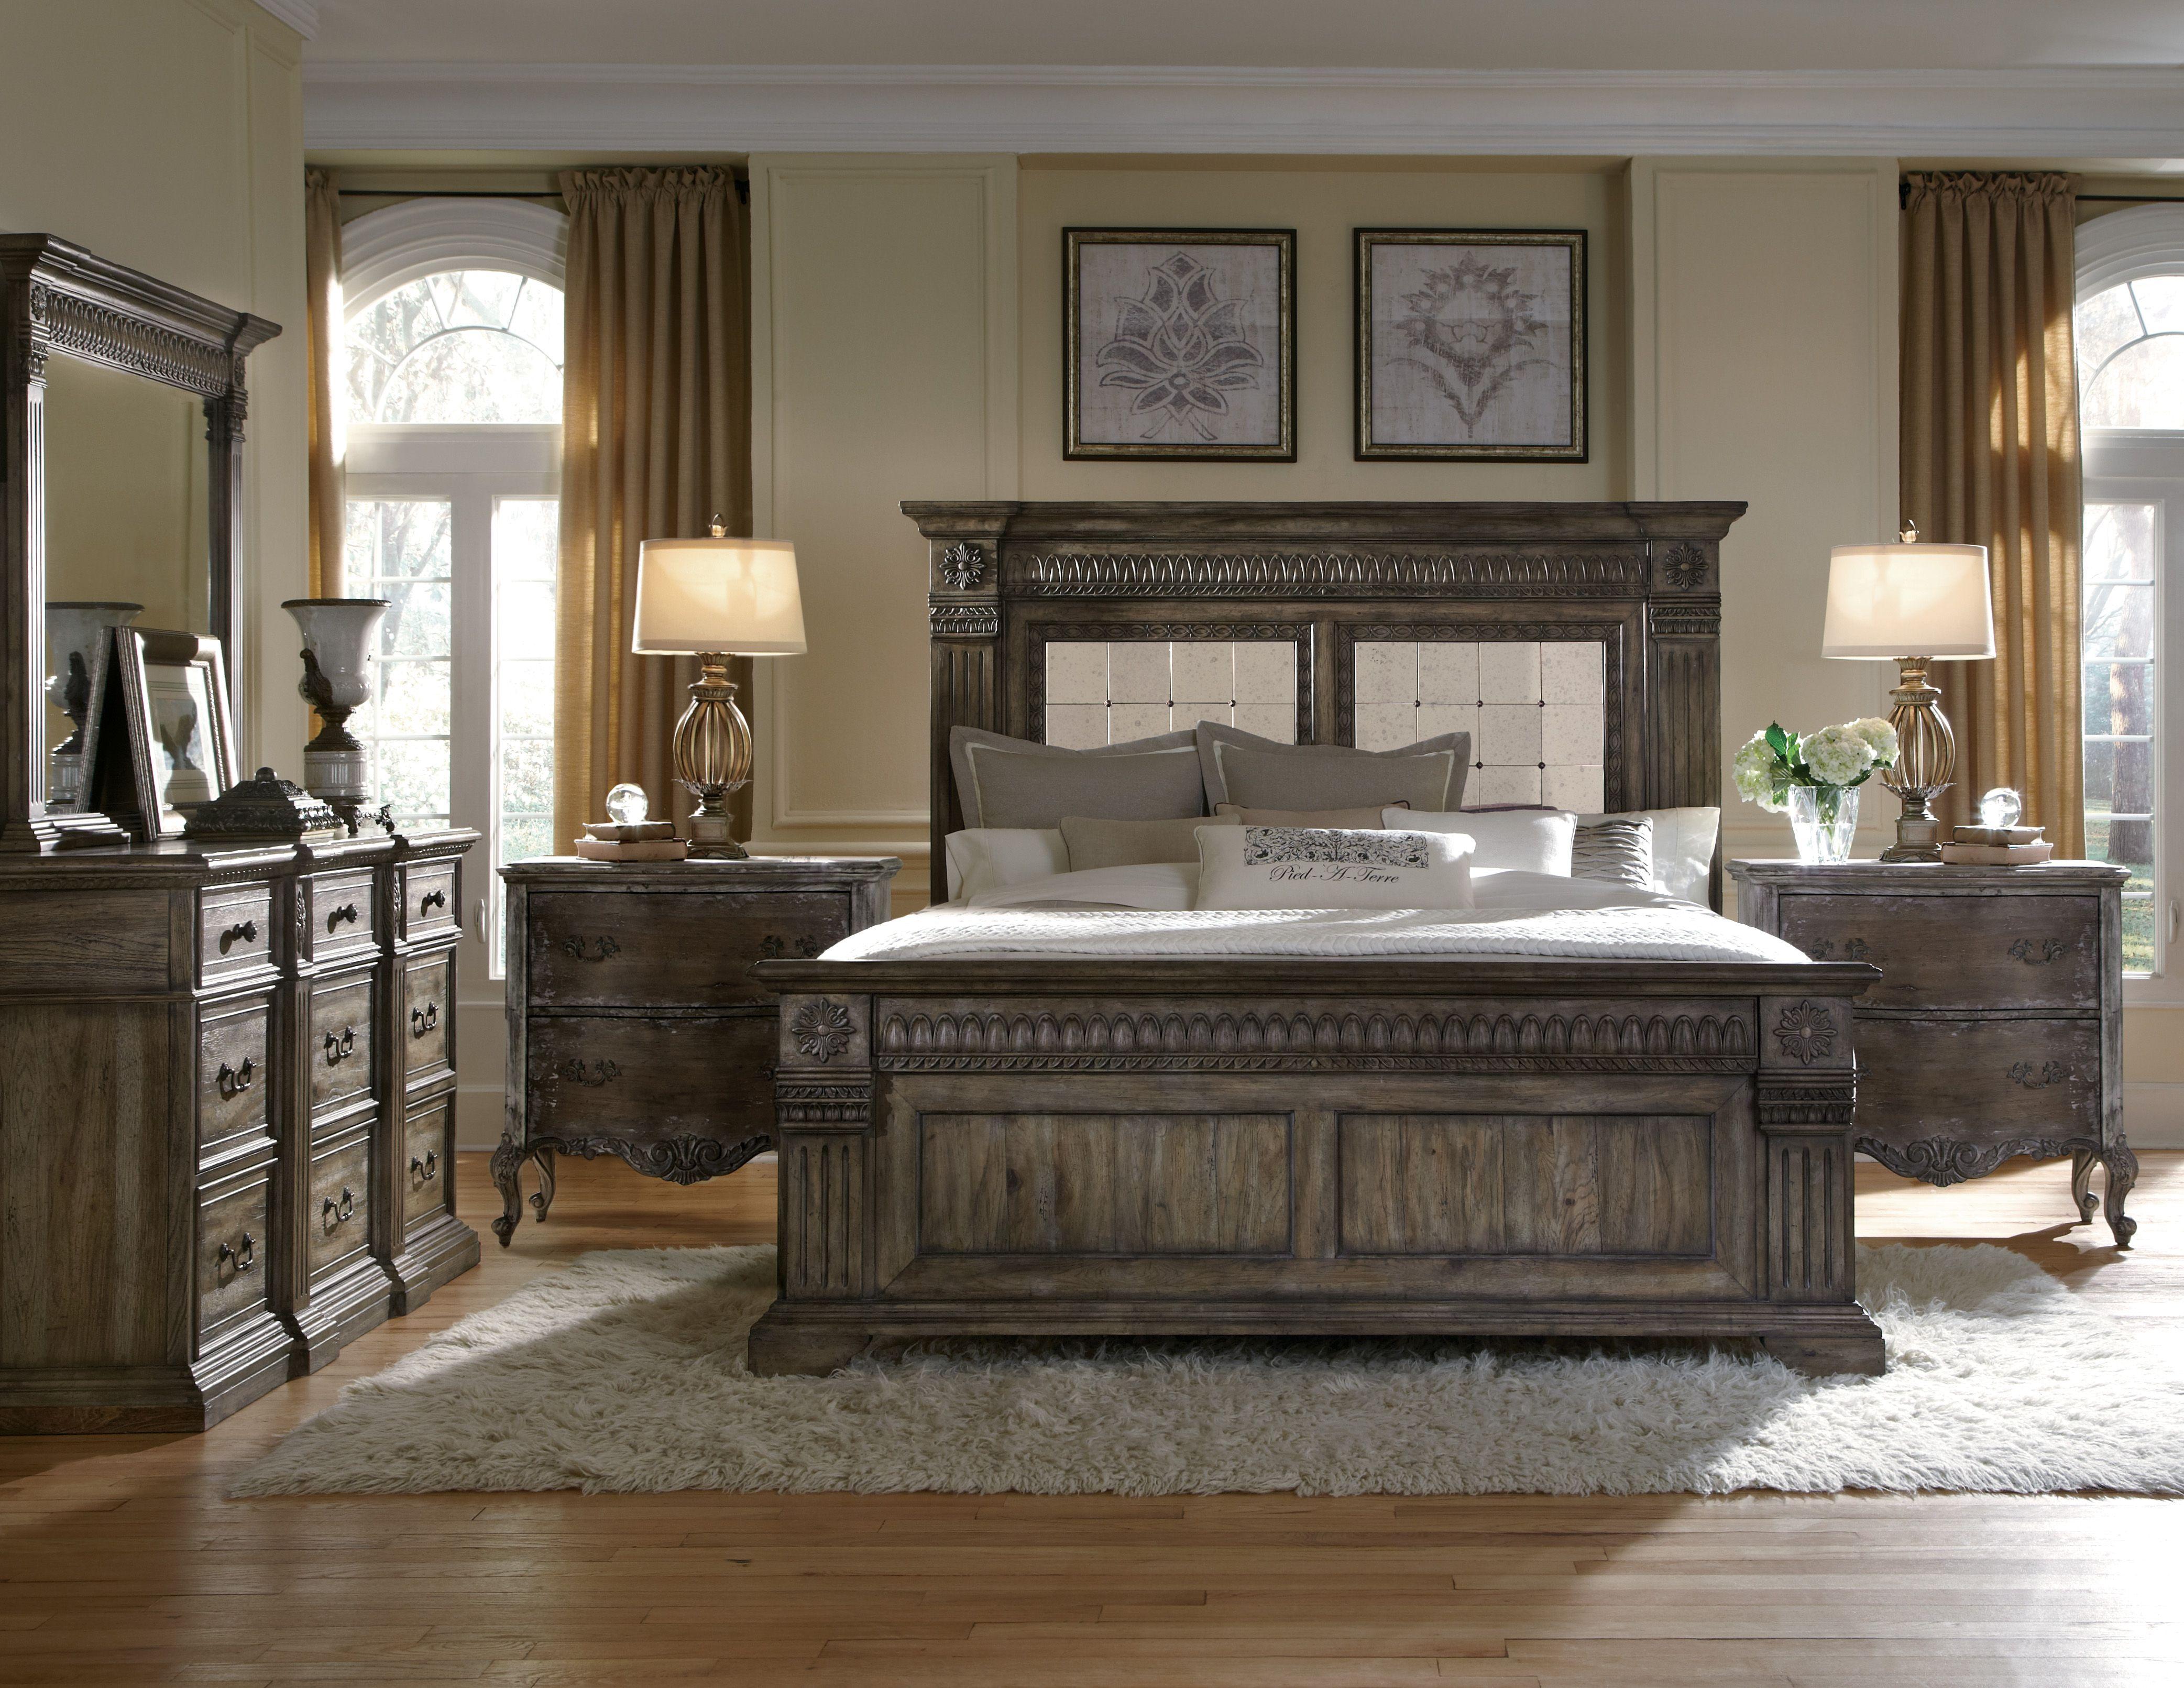 Arabella Accentrics Home Bedroom furniture. Matching